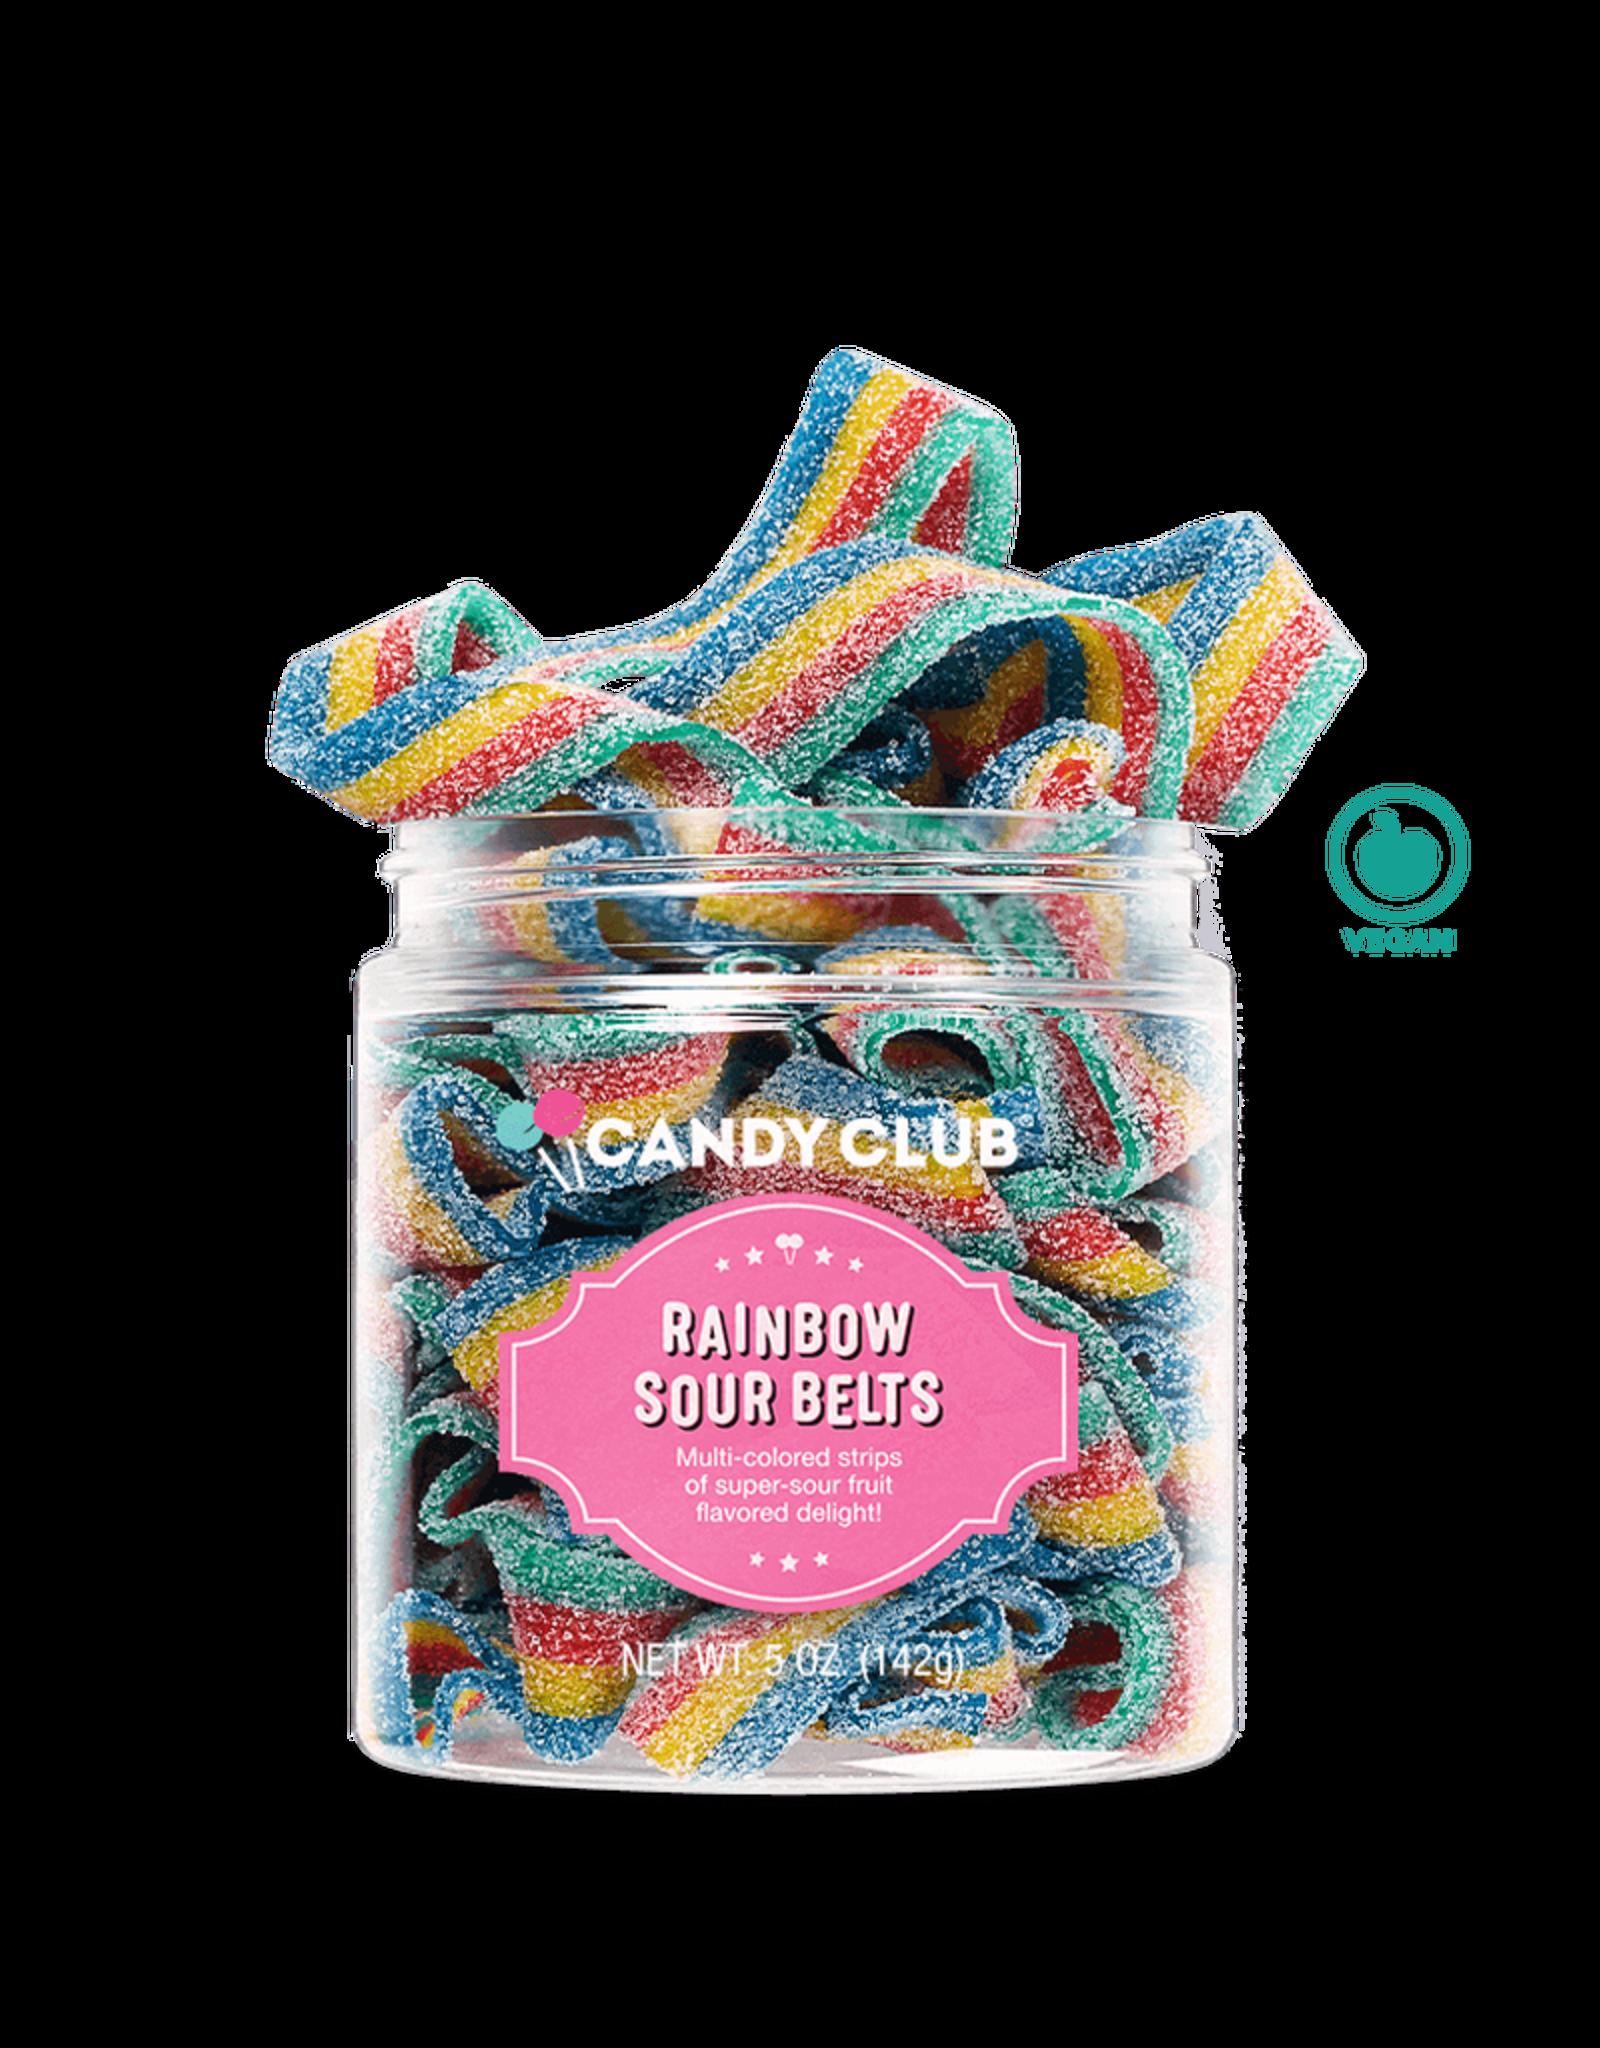 Candy Club Candy Club - Rainbow Sour Belts